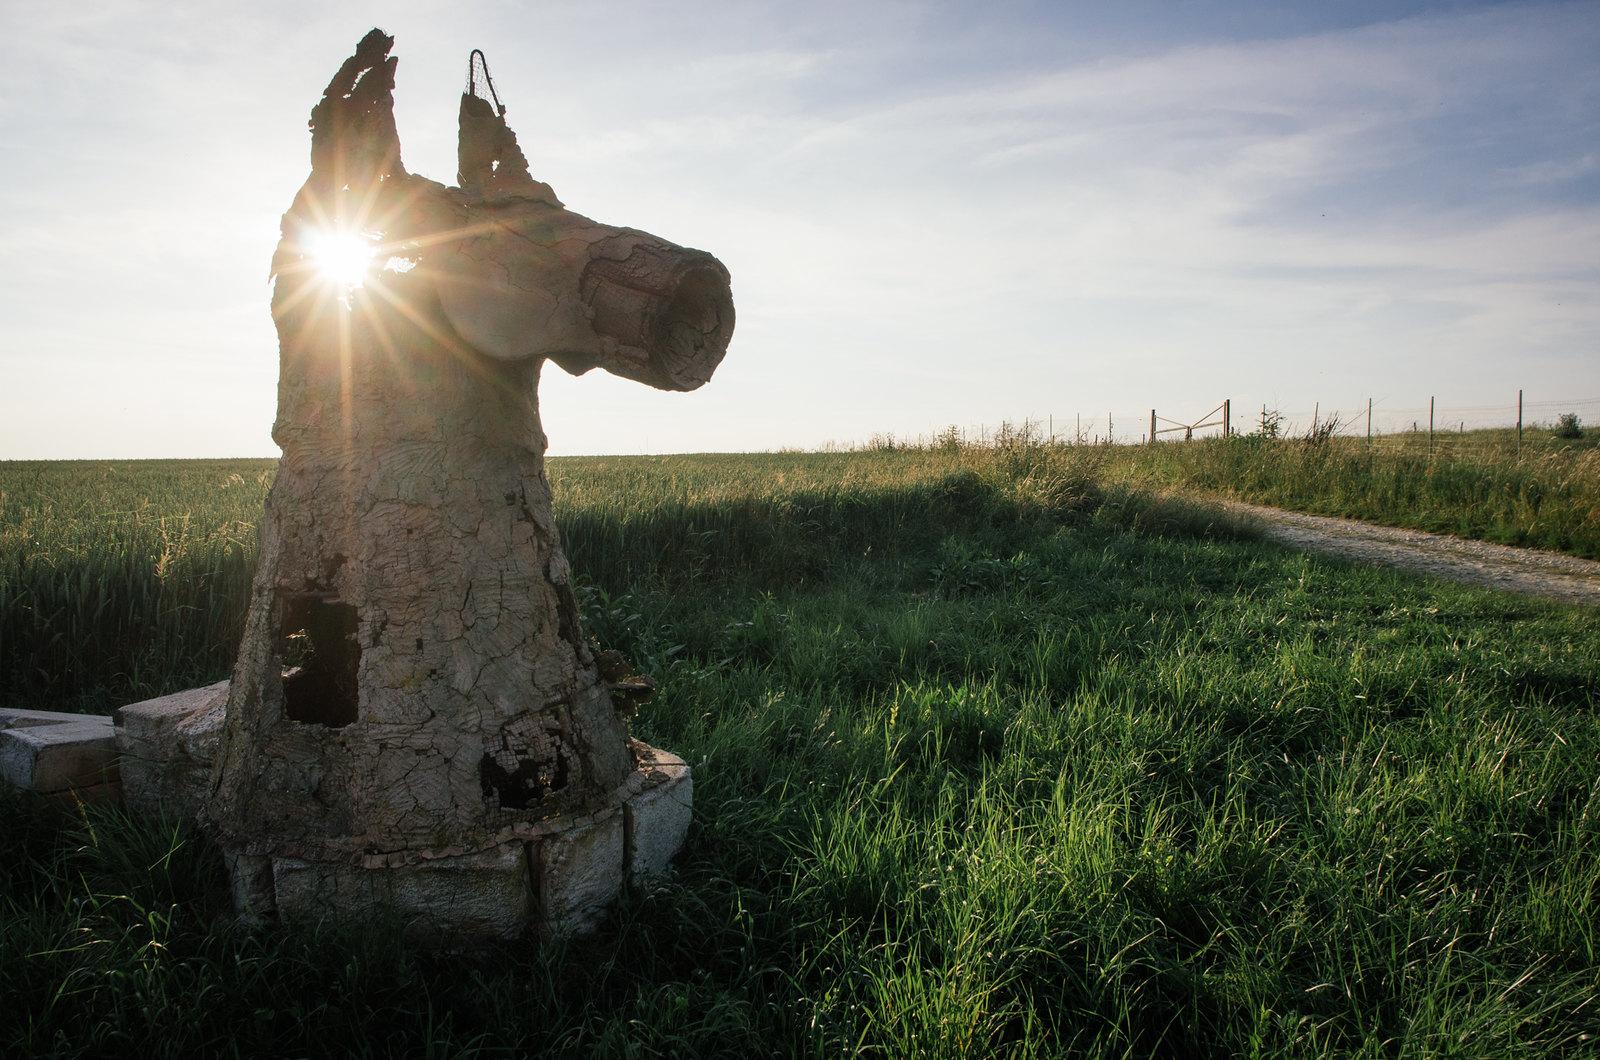 Randonner en Argonne - Balades en âne - Les expos